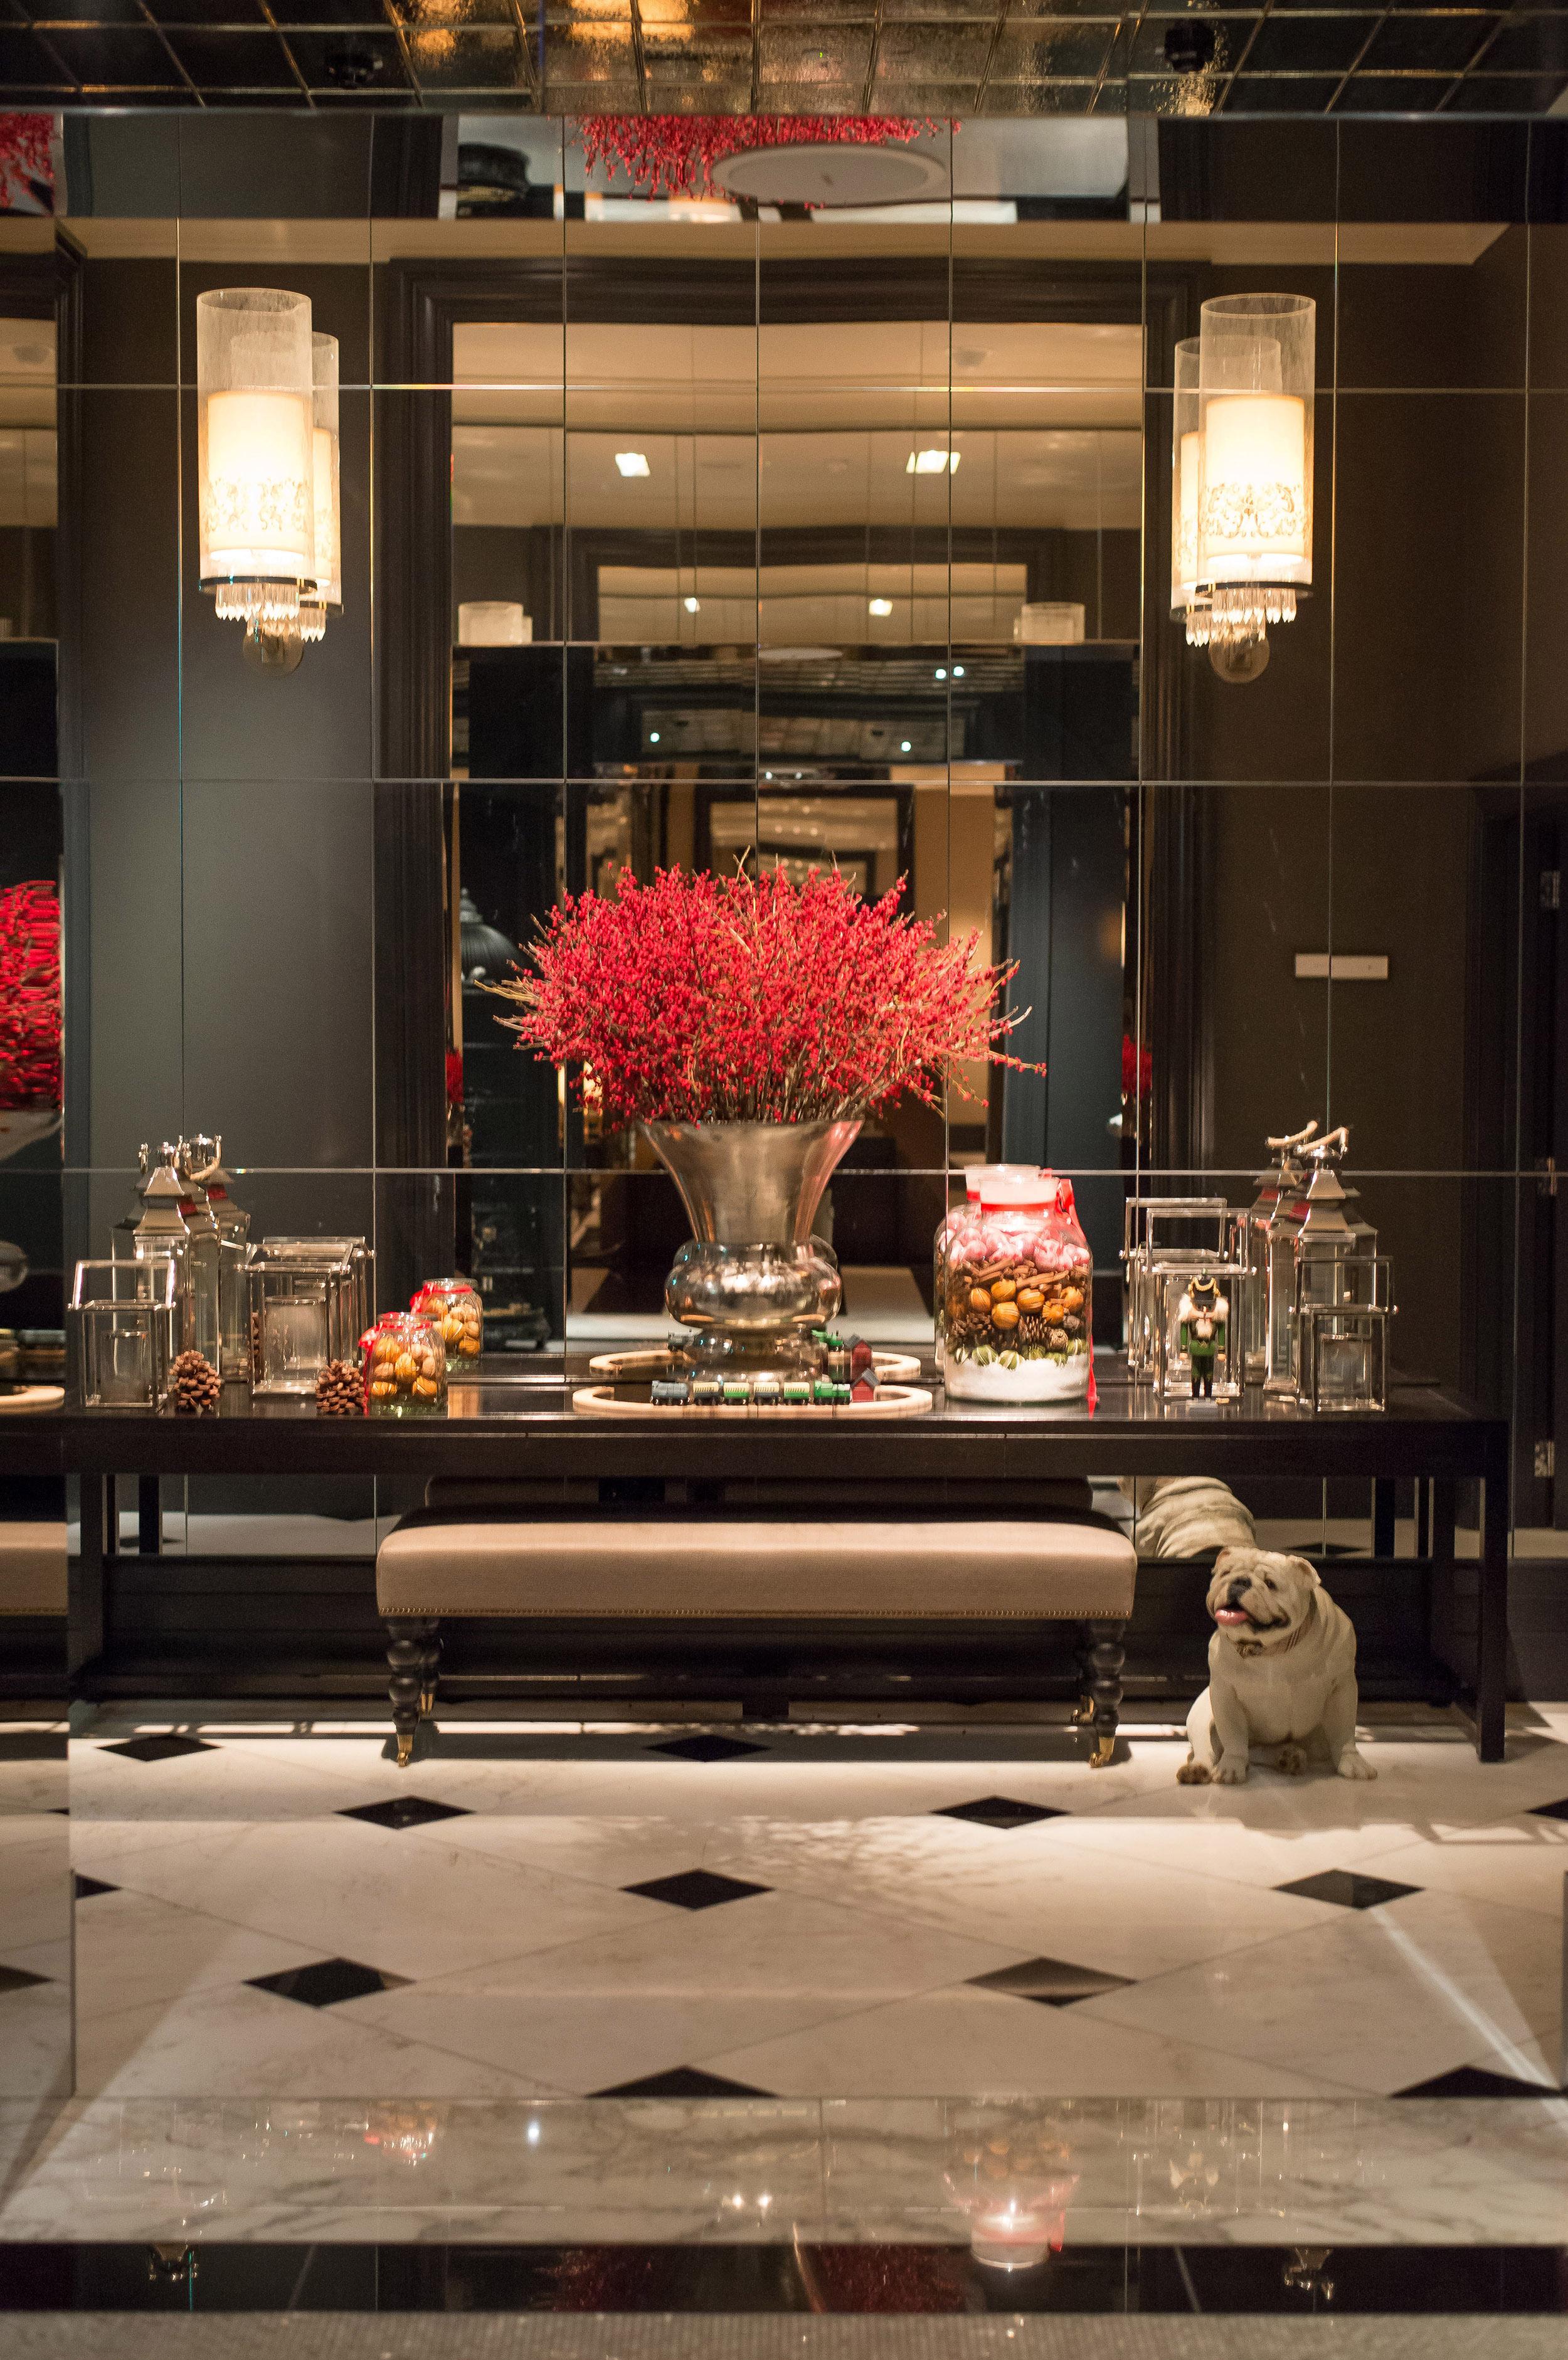 ....bespoke furniture   rosewood london : side table..特别定制家具   瑰丽伦敦酒店:条桌....